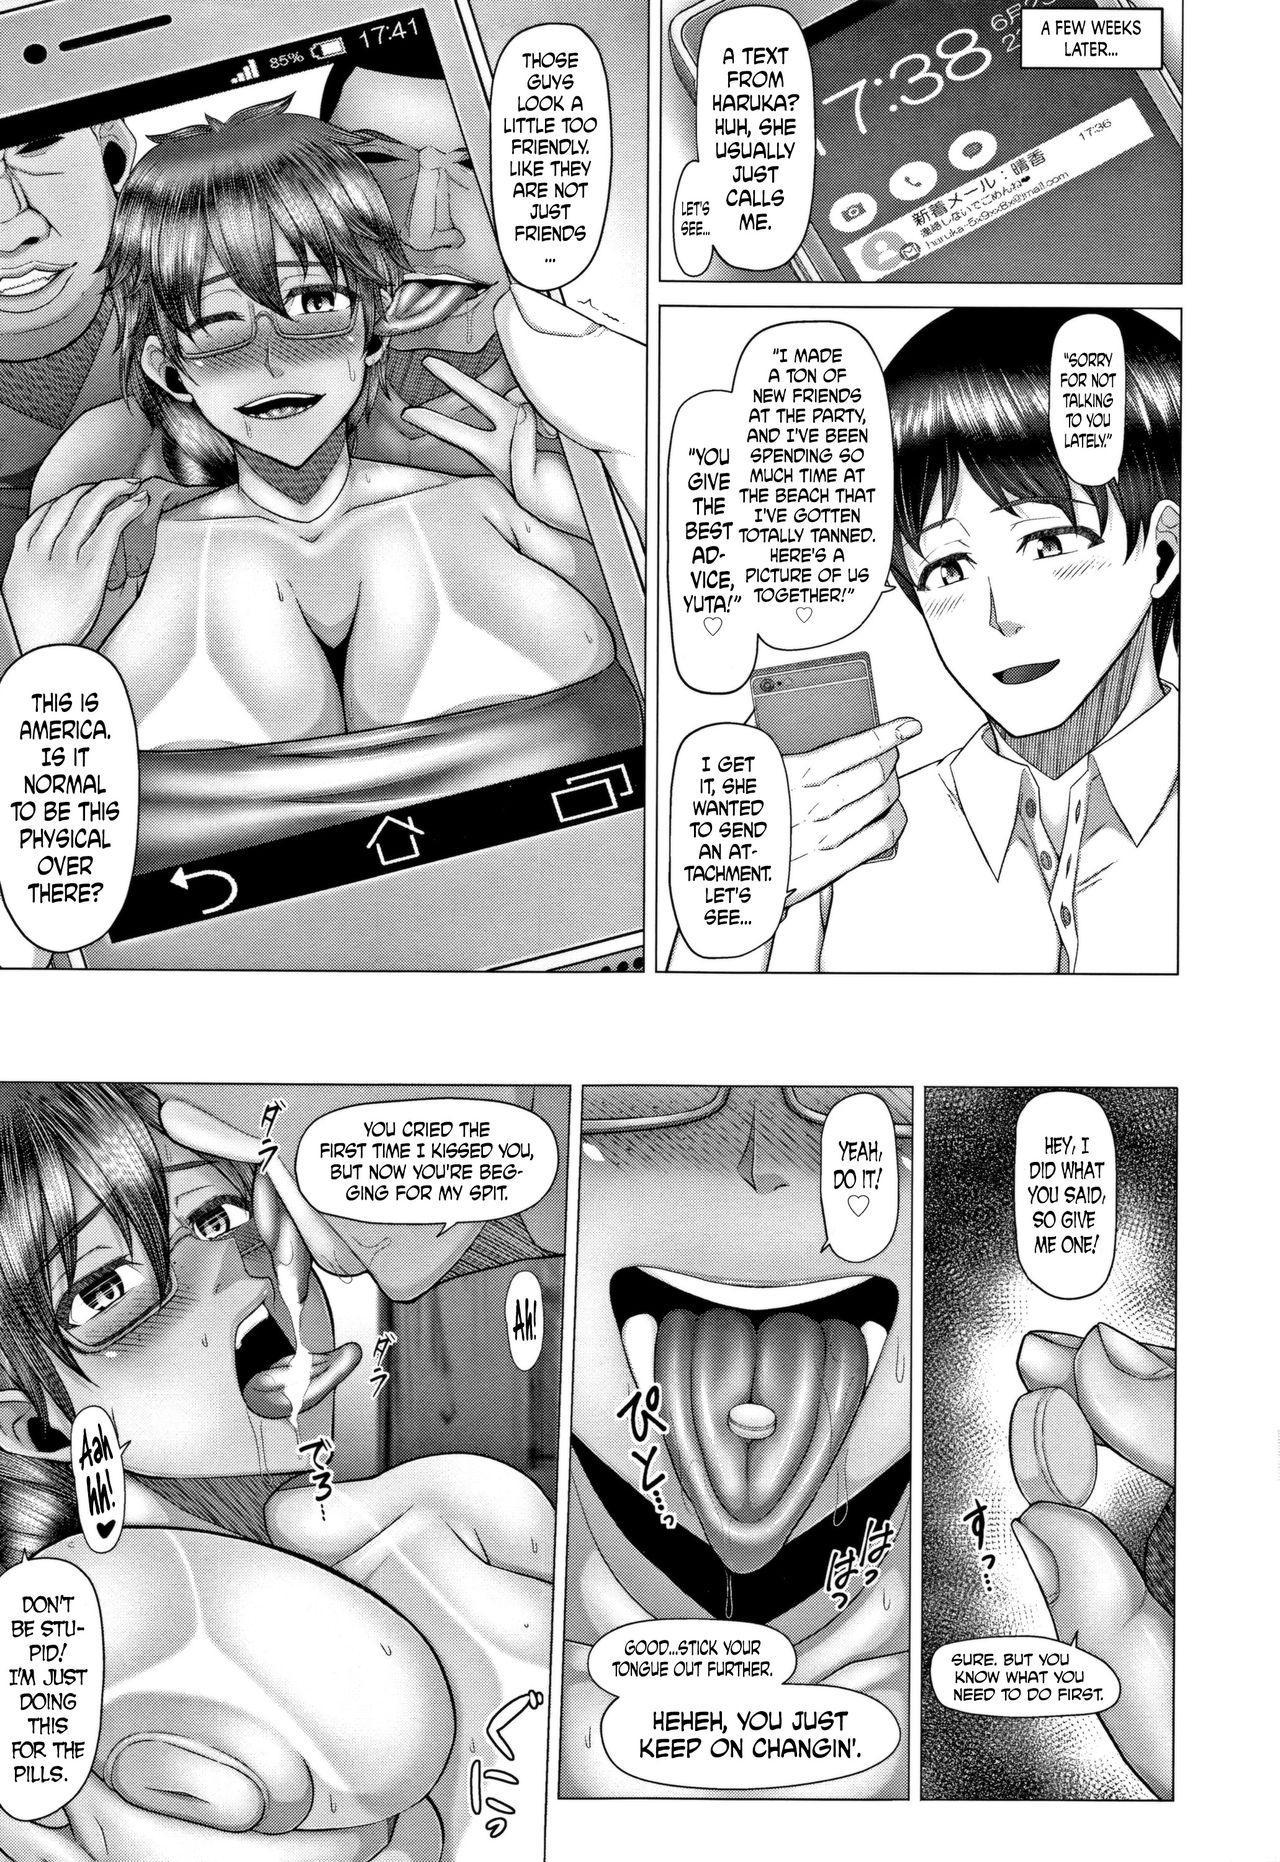 [Inoue Nanaki] Joushiki Daha! Kuro Gal Bitch-ka Seikatsu Ch. 1-3, 5-8 [English] [Dark Mac + N04h] 88